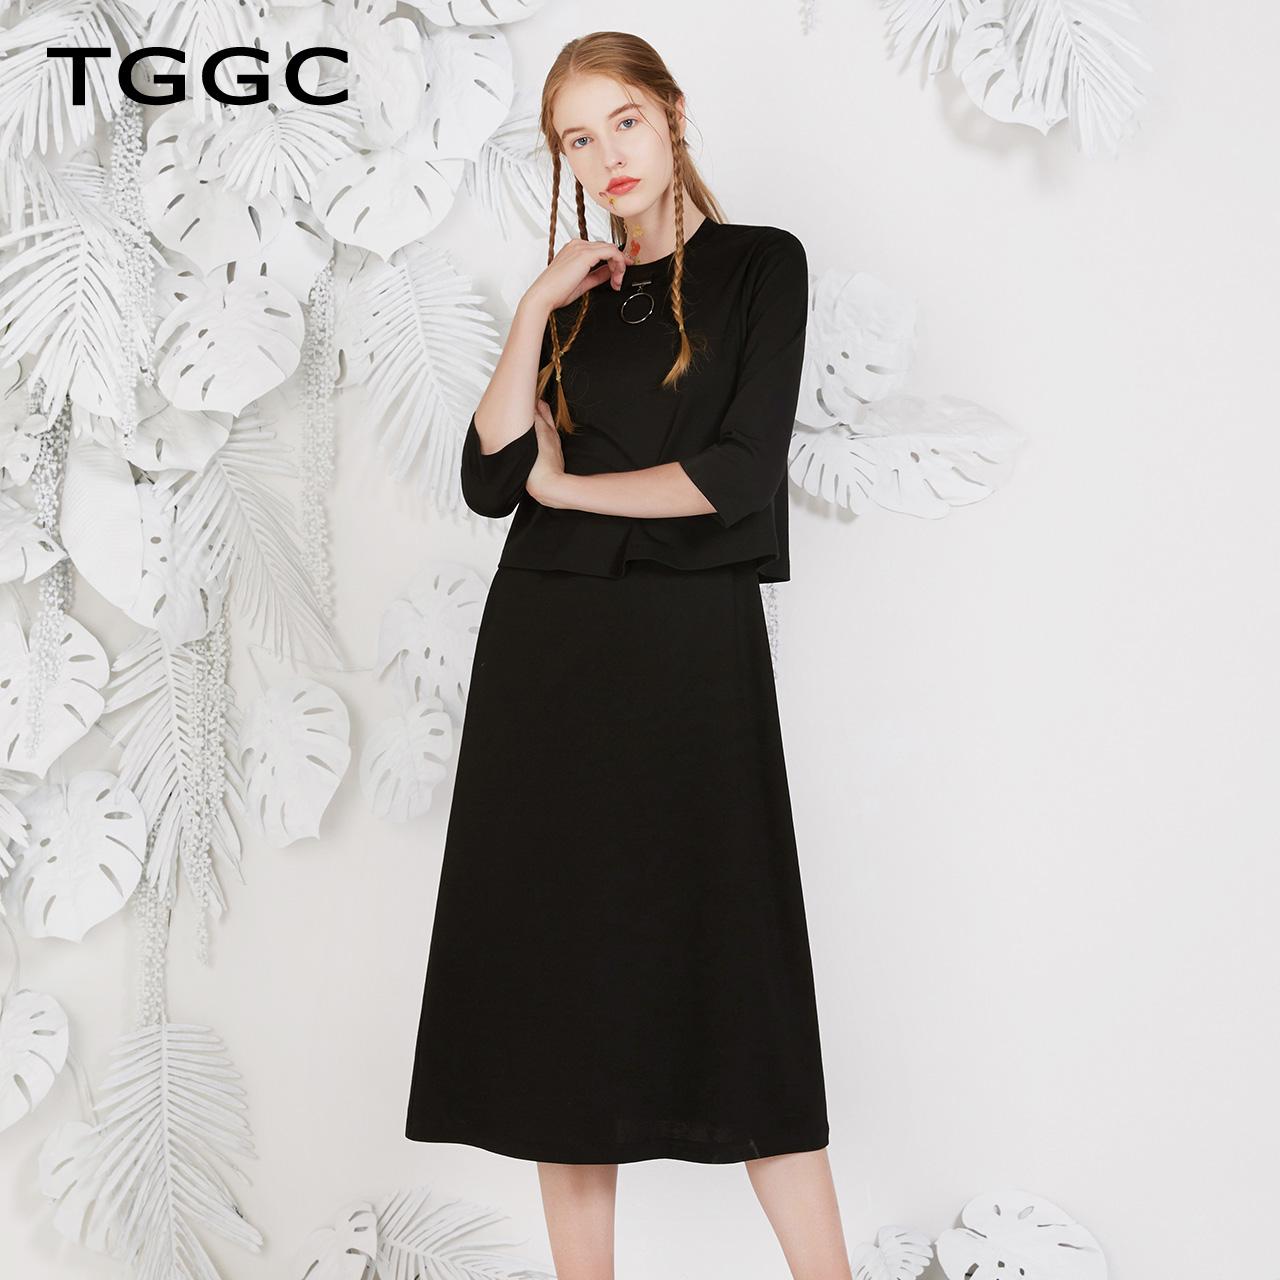 TGGC2018年春夏新款通勤简约两件套七分袖直筒中长款连衣裙F27382